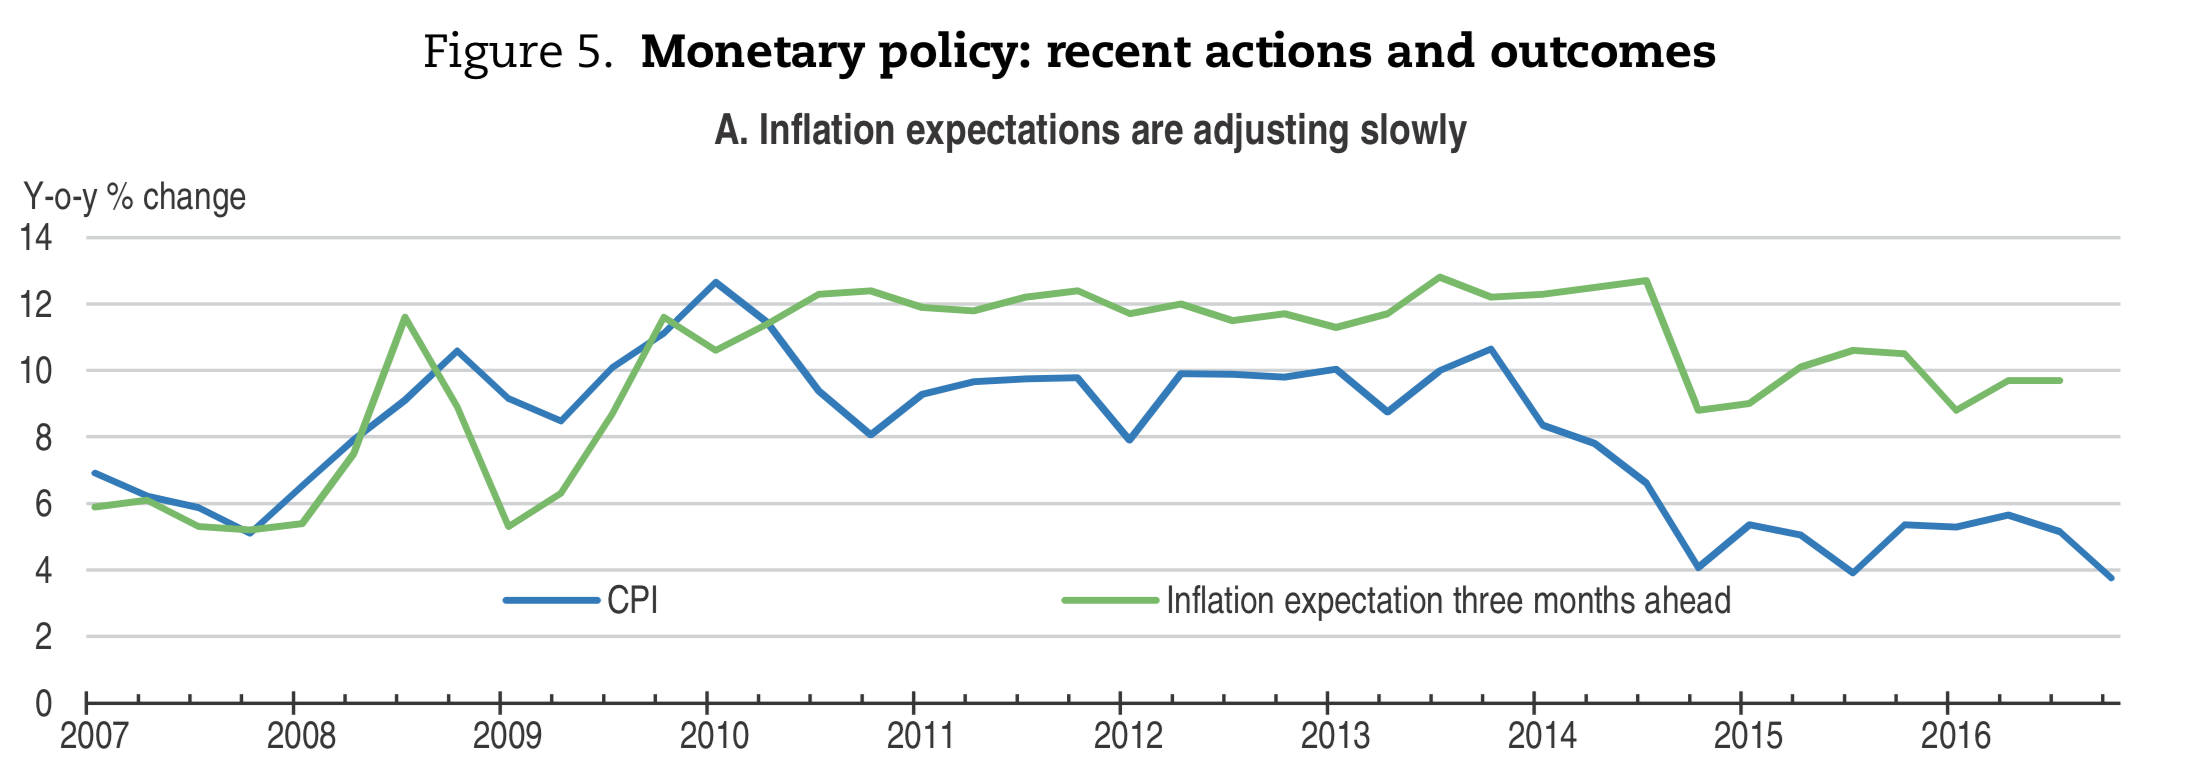 Source: OECD, 2017